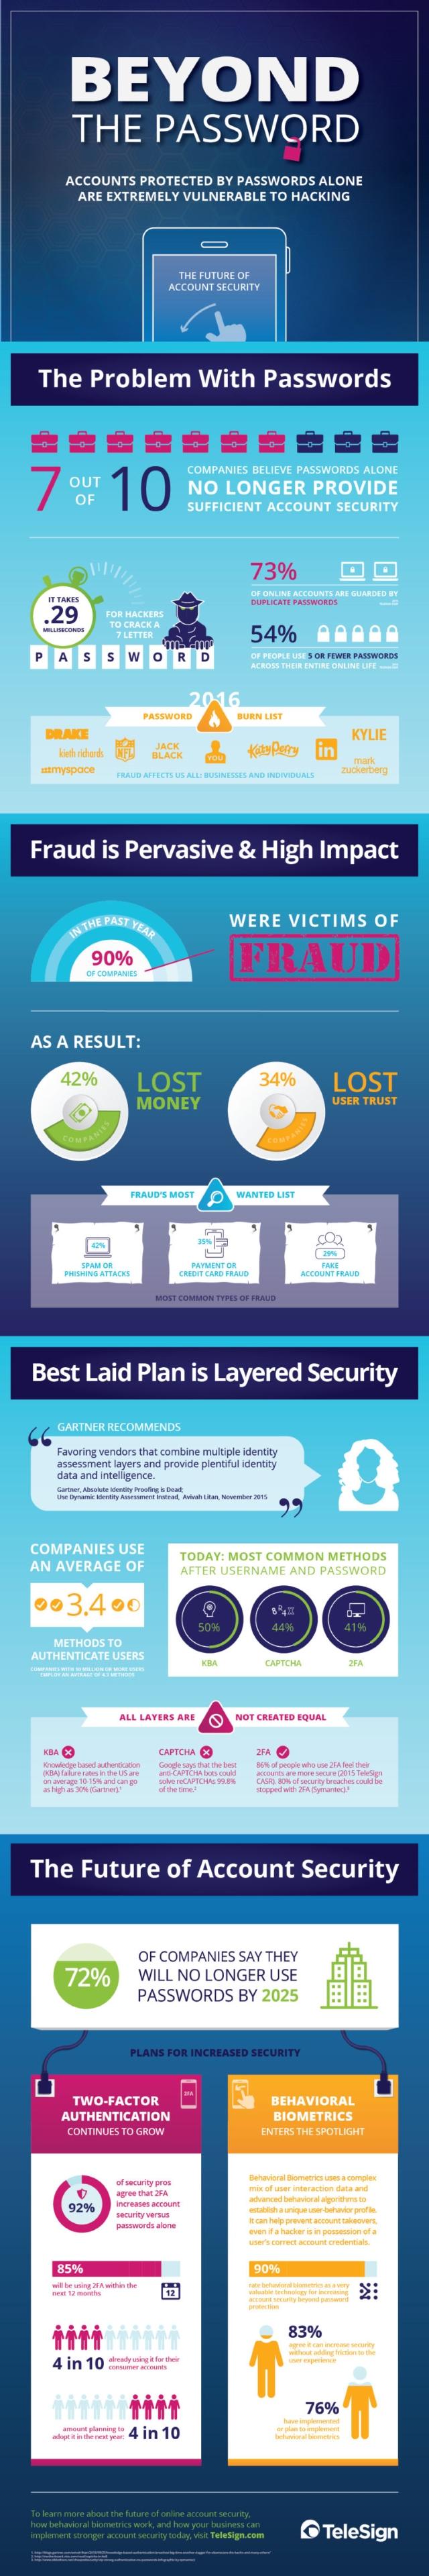 TeleSign account security infographic